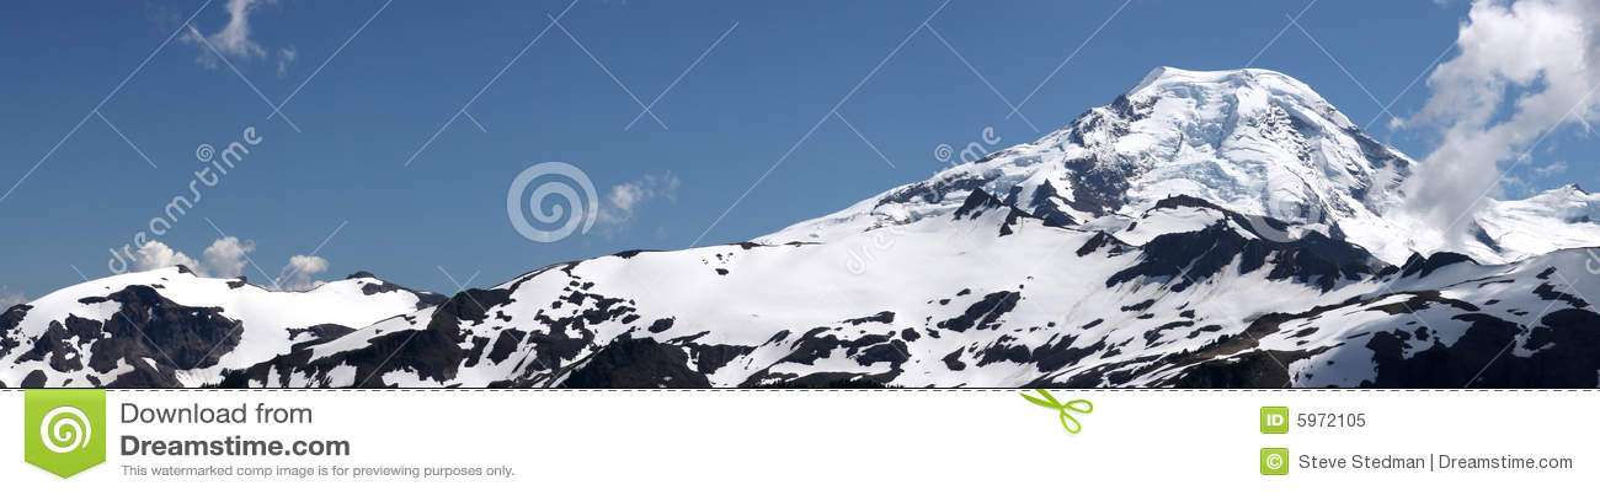 Panorama de montagne